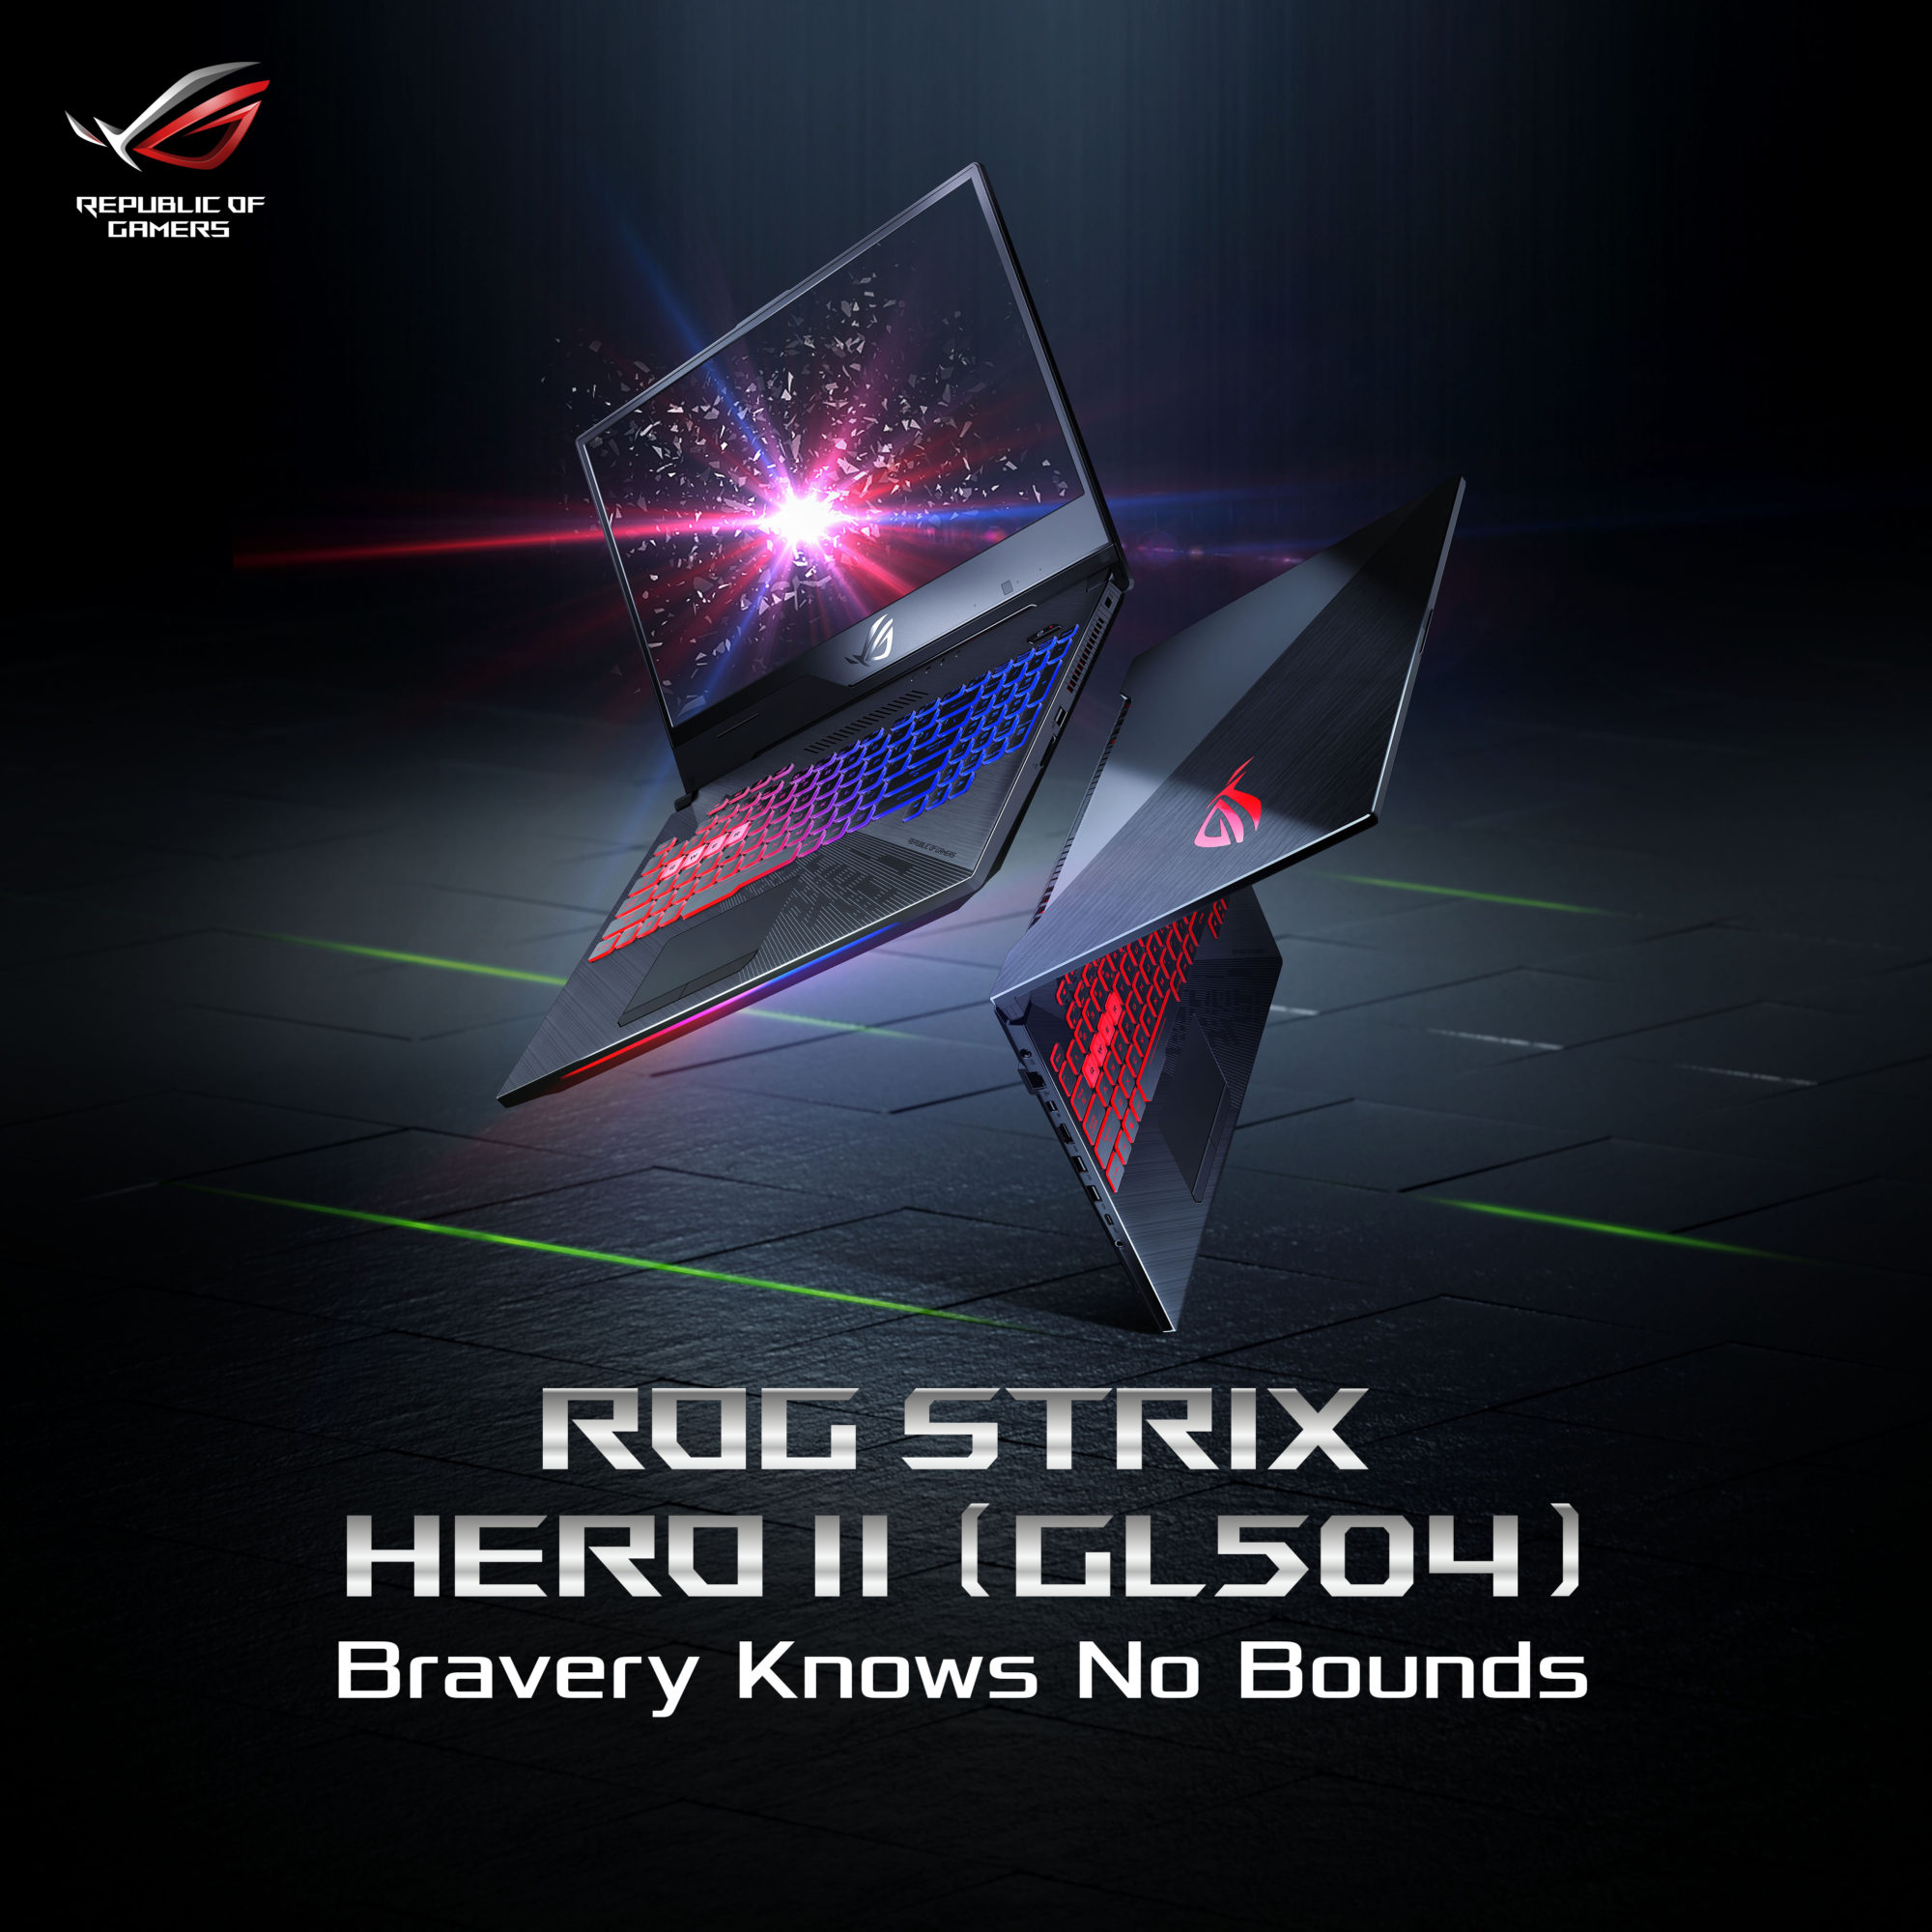 ROG Strix Hero II GL504